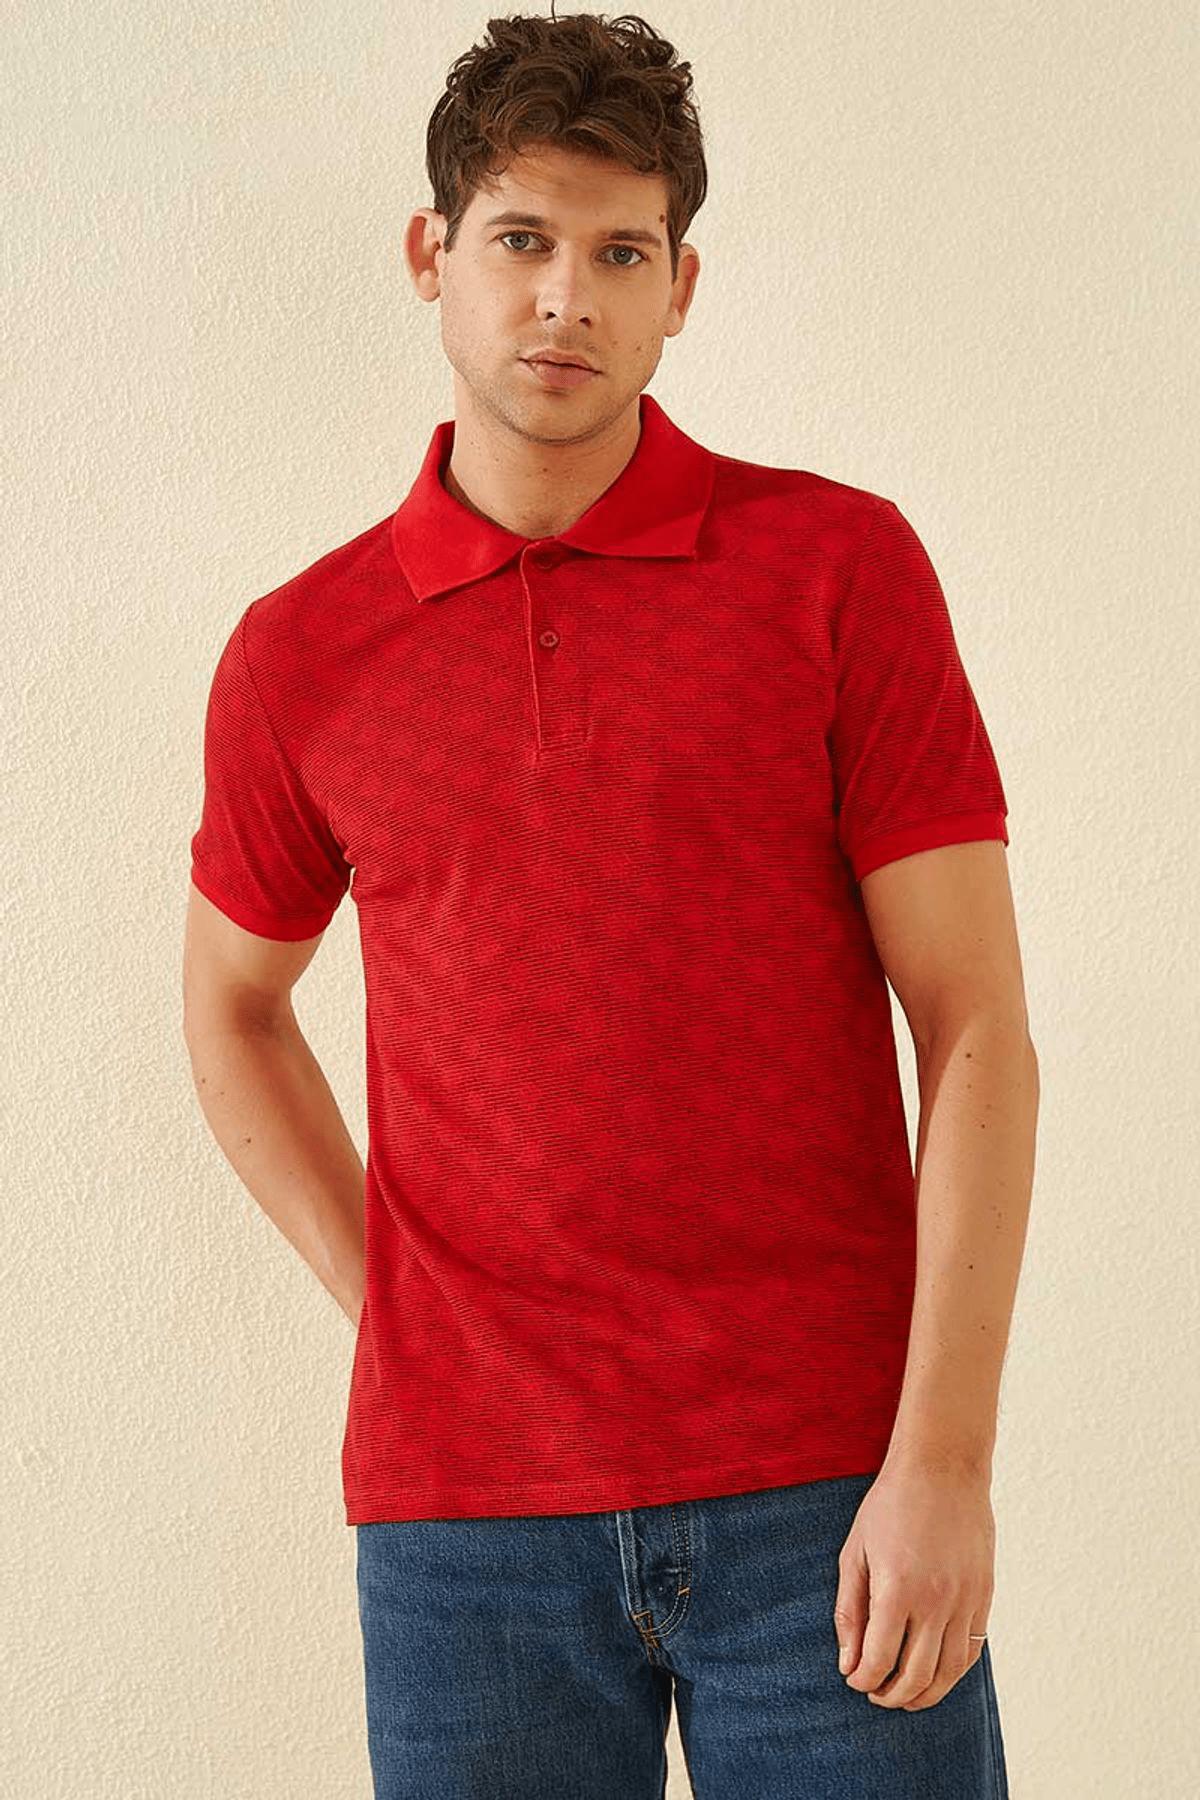 Tommy Life Baskılı Polo Yaka Kırmızı Erkek T-Shirt T08ER-87796_1 1